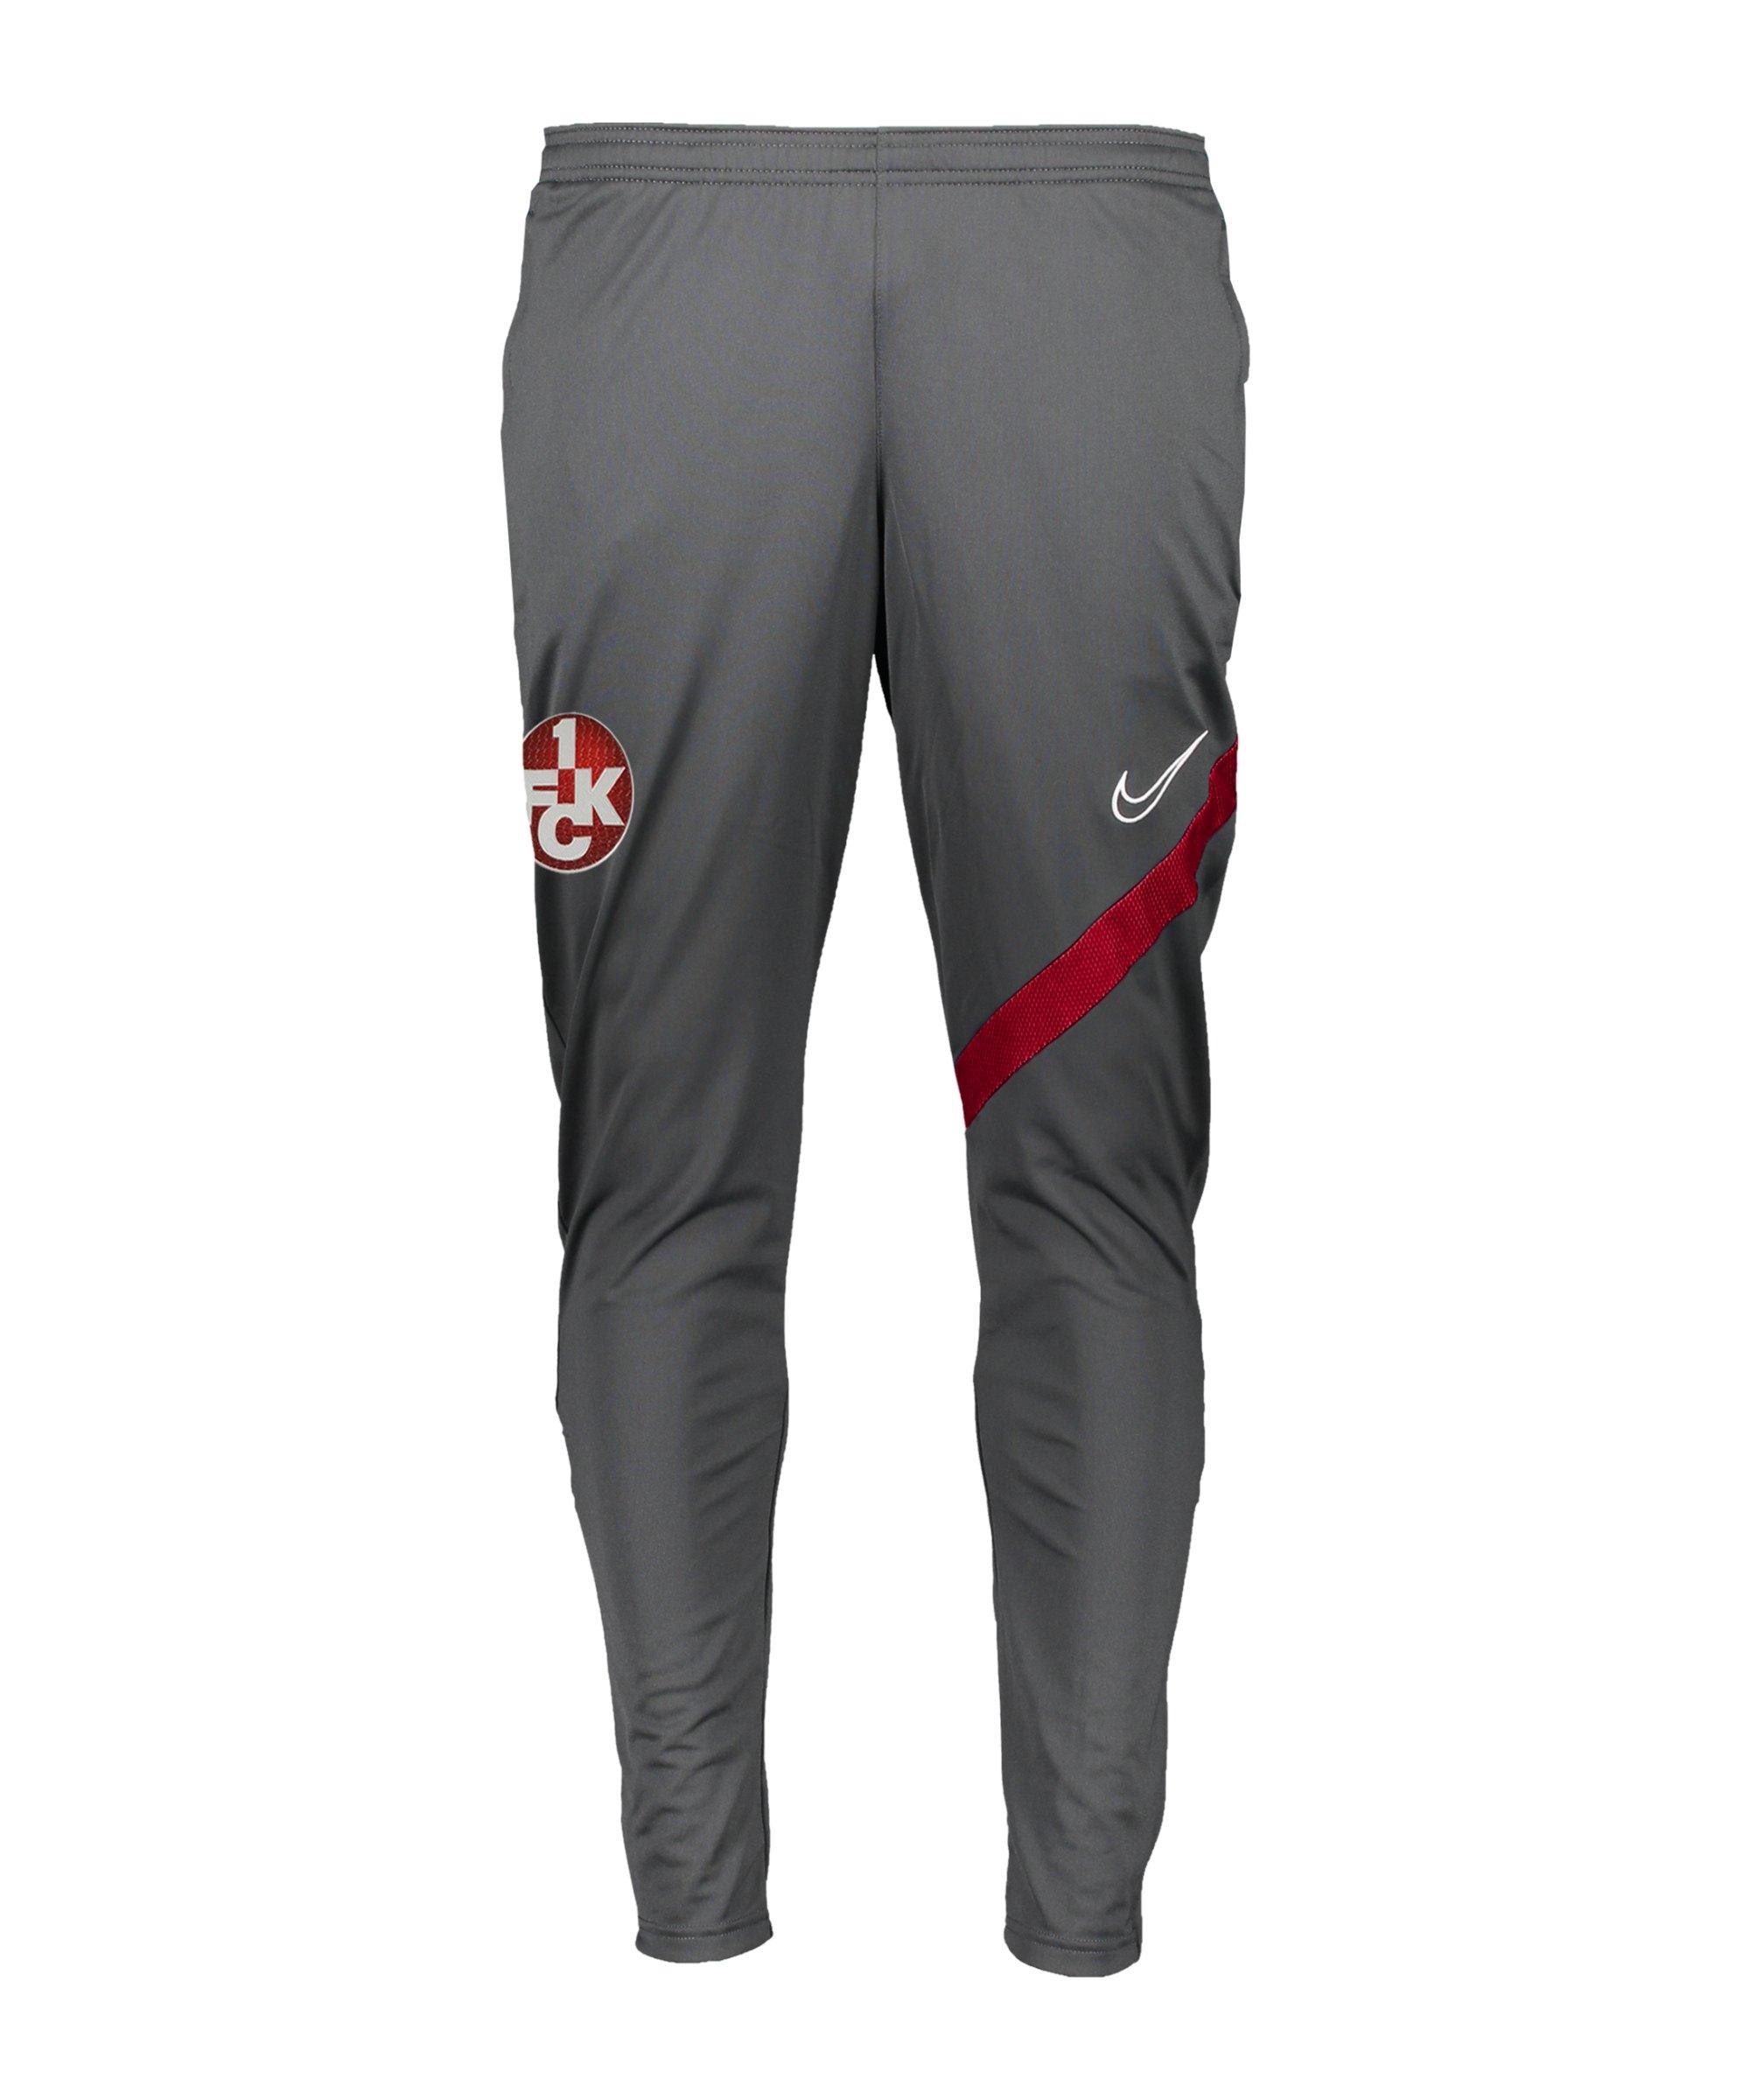 Nike 1. FC Kaiserslautern Hose Kids F060 - grau